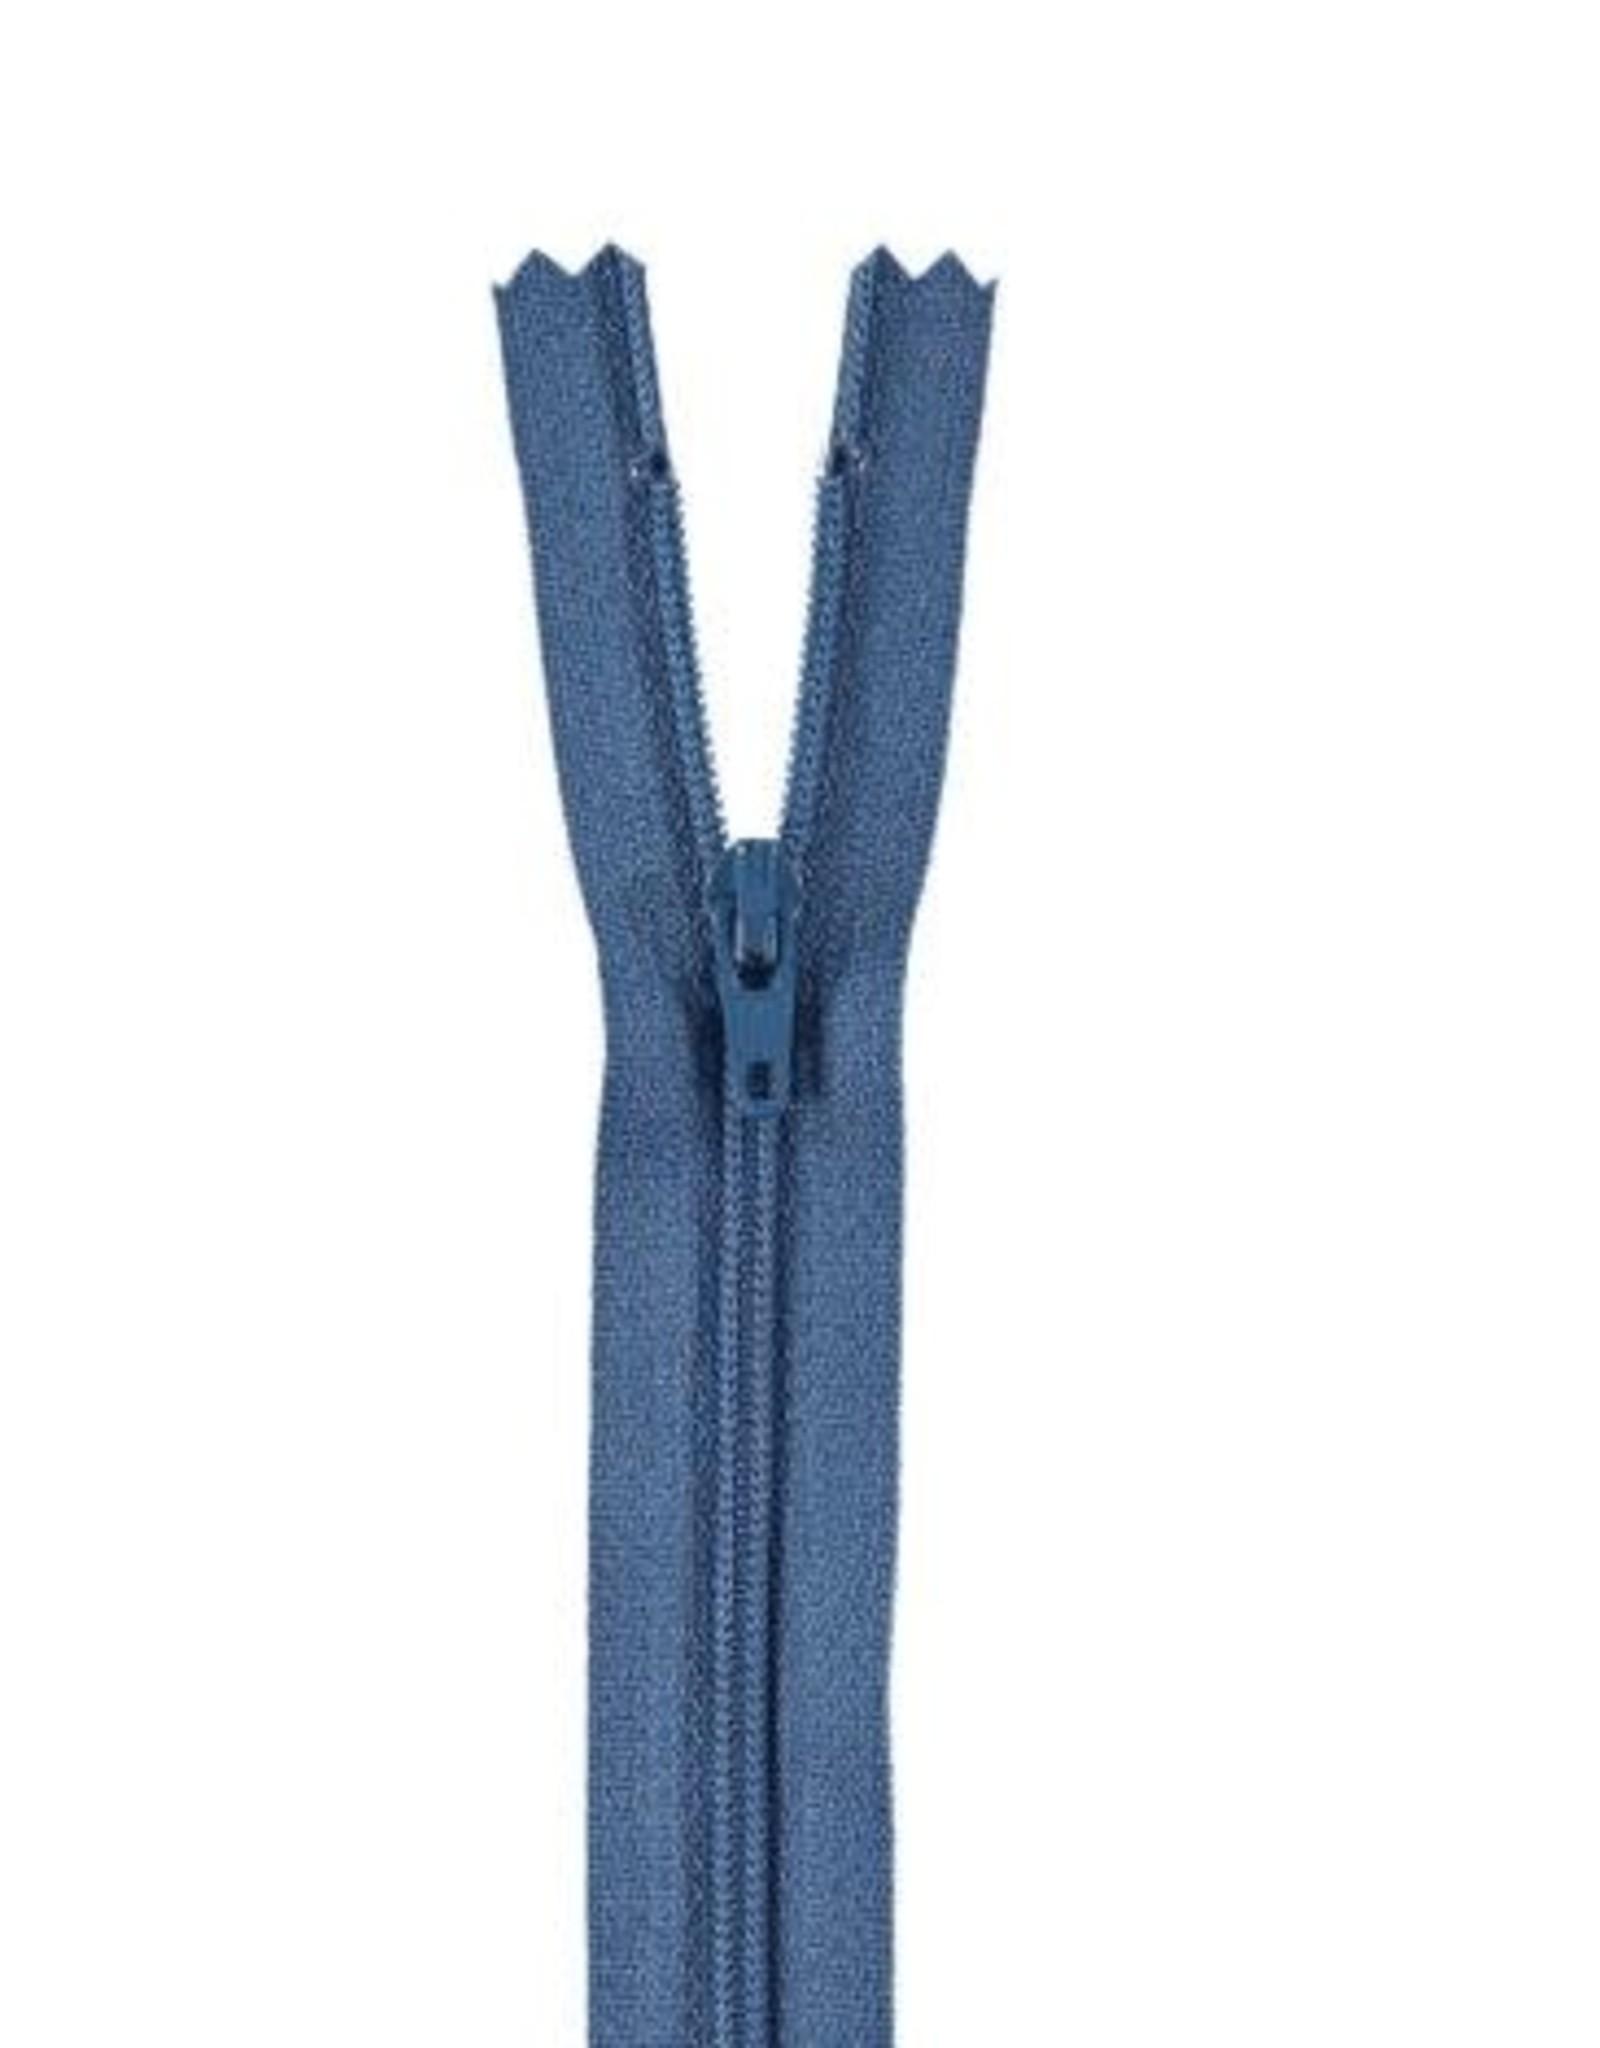 YKK Spiraalrits niet-DB 3mm jeansblauw 839-18cm